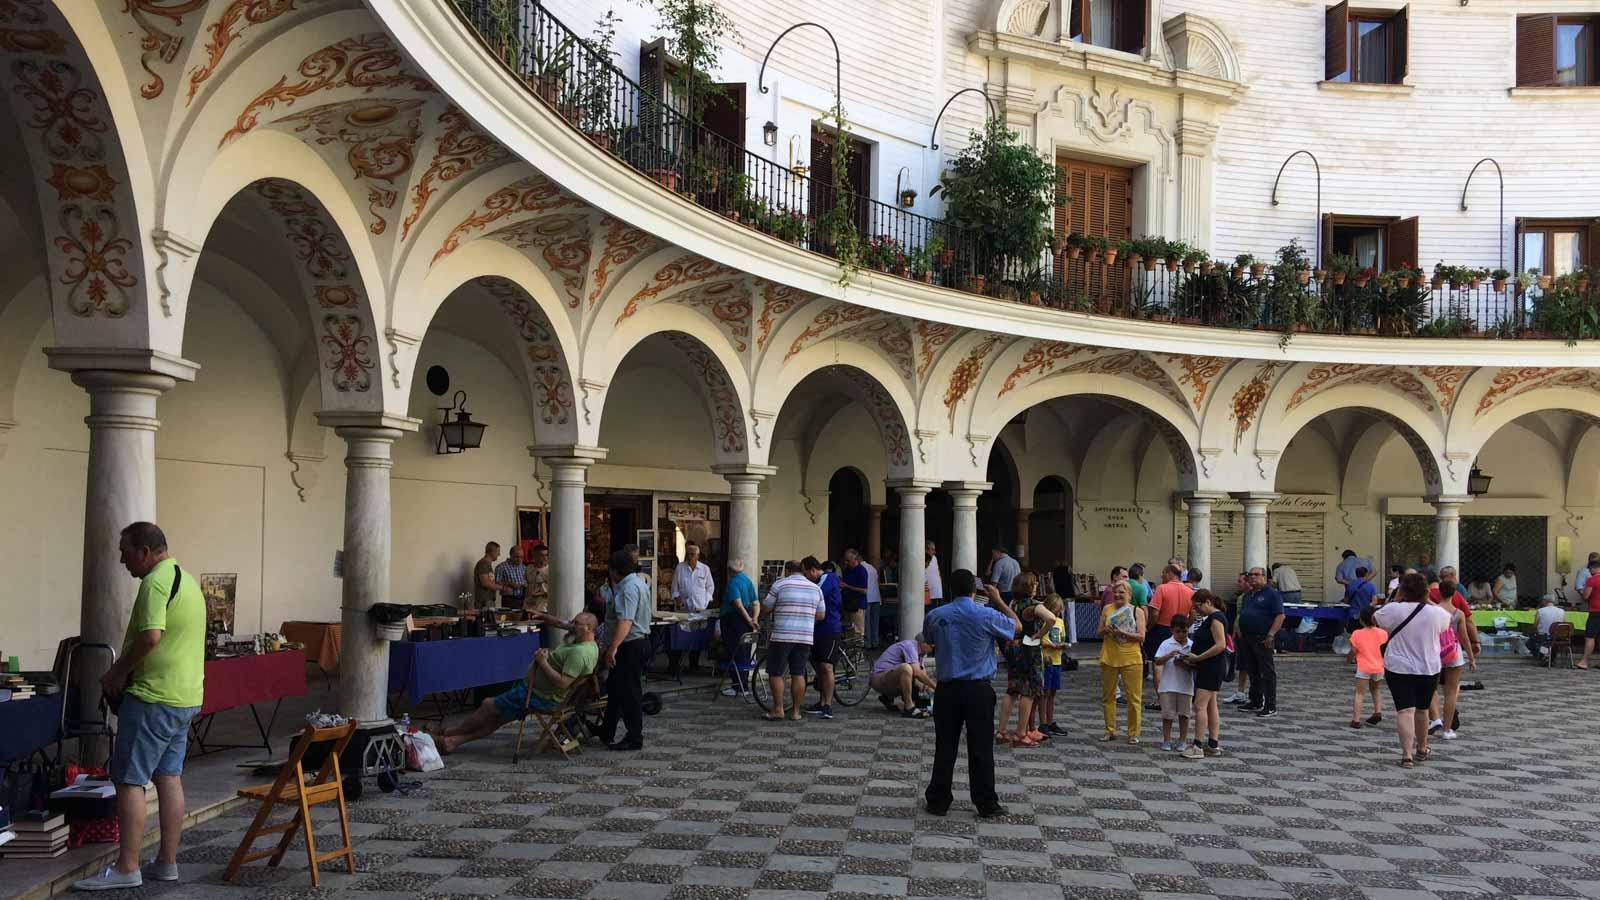 seville cabildo square craft market